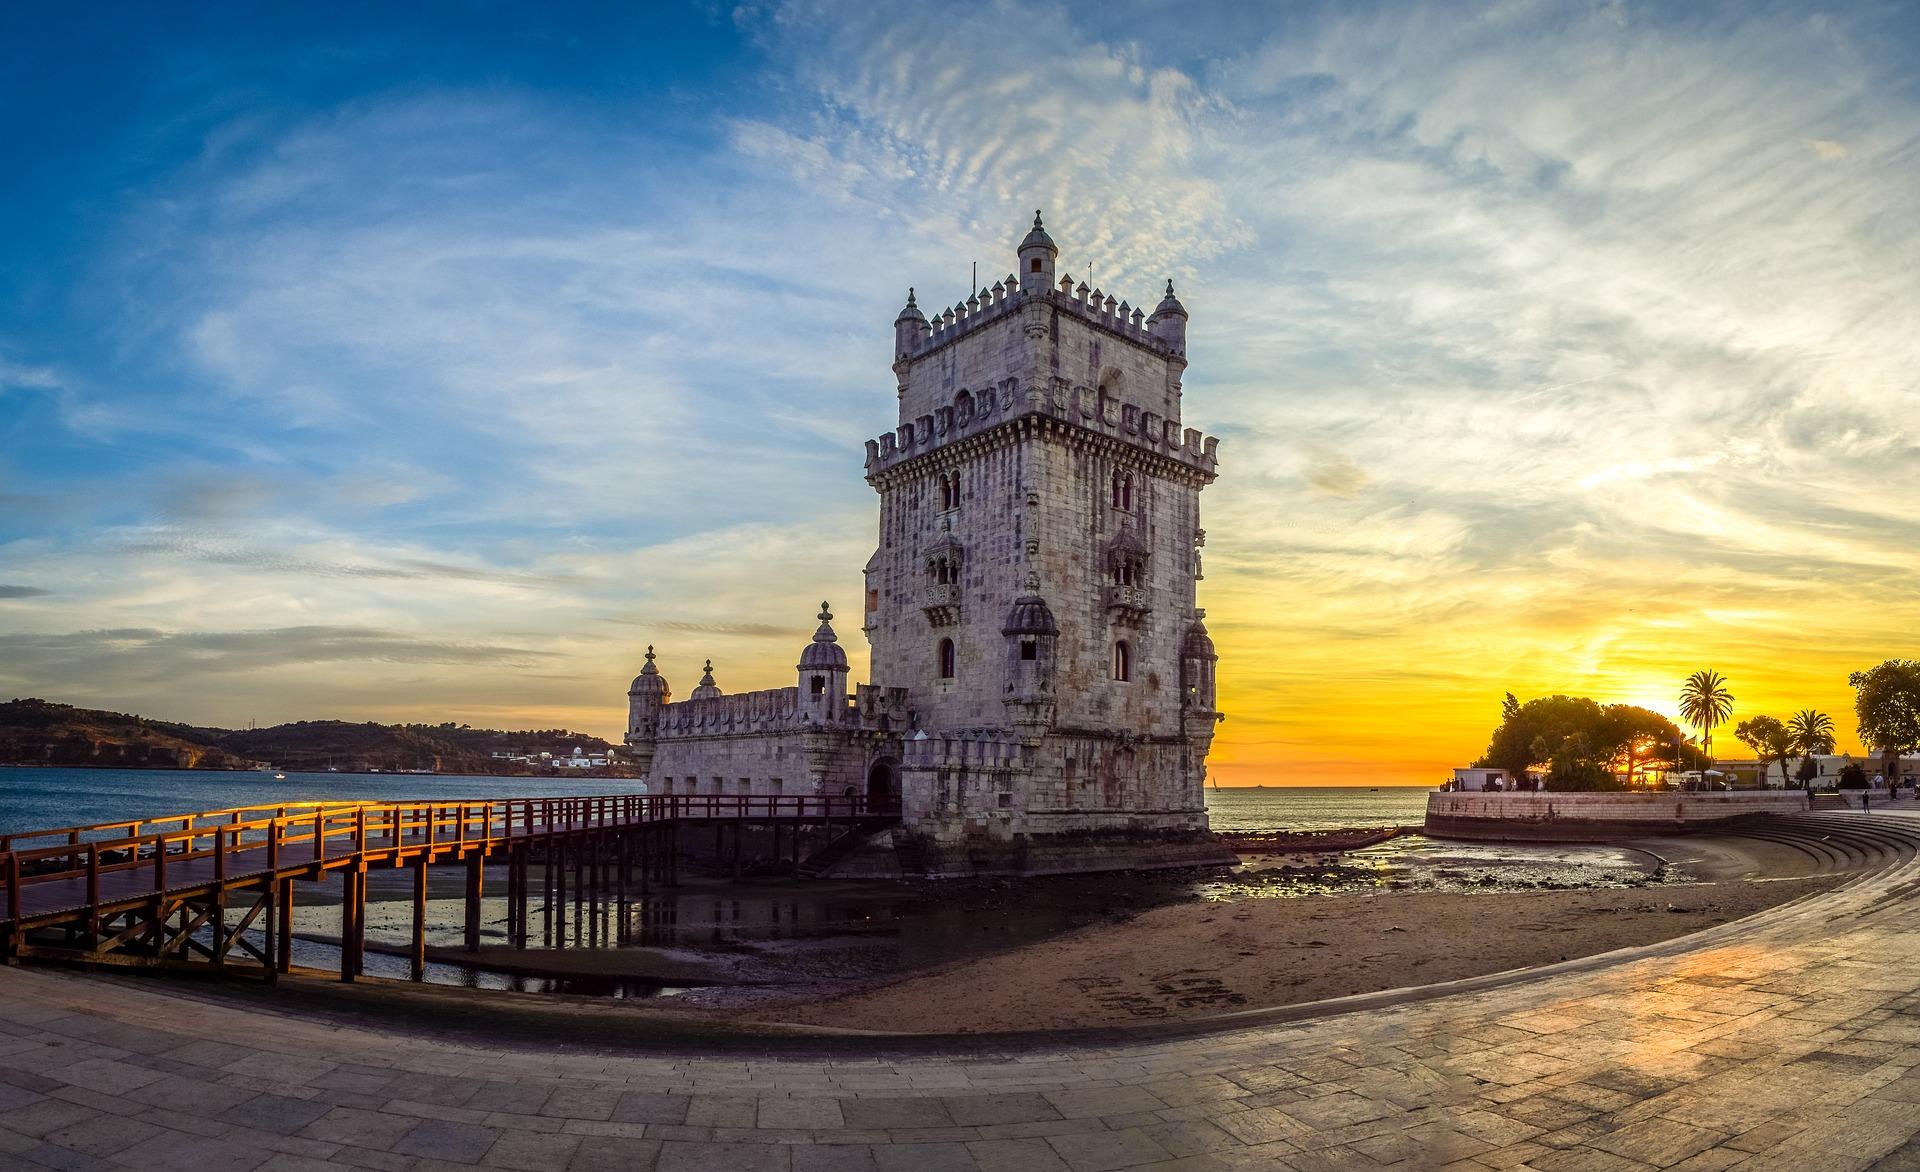 Belem Tower- Portugal